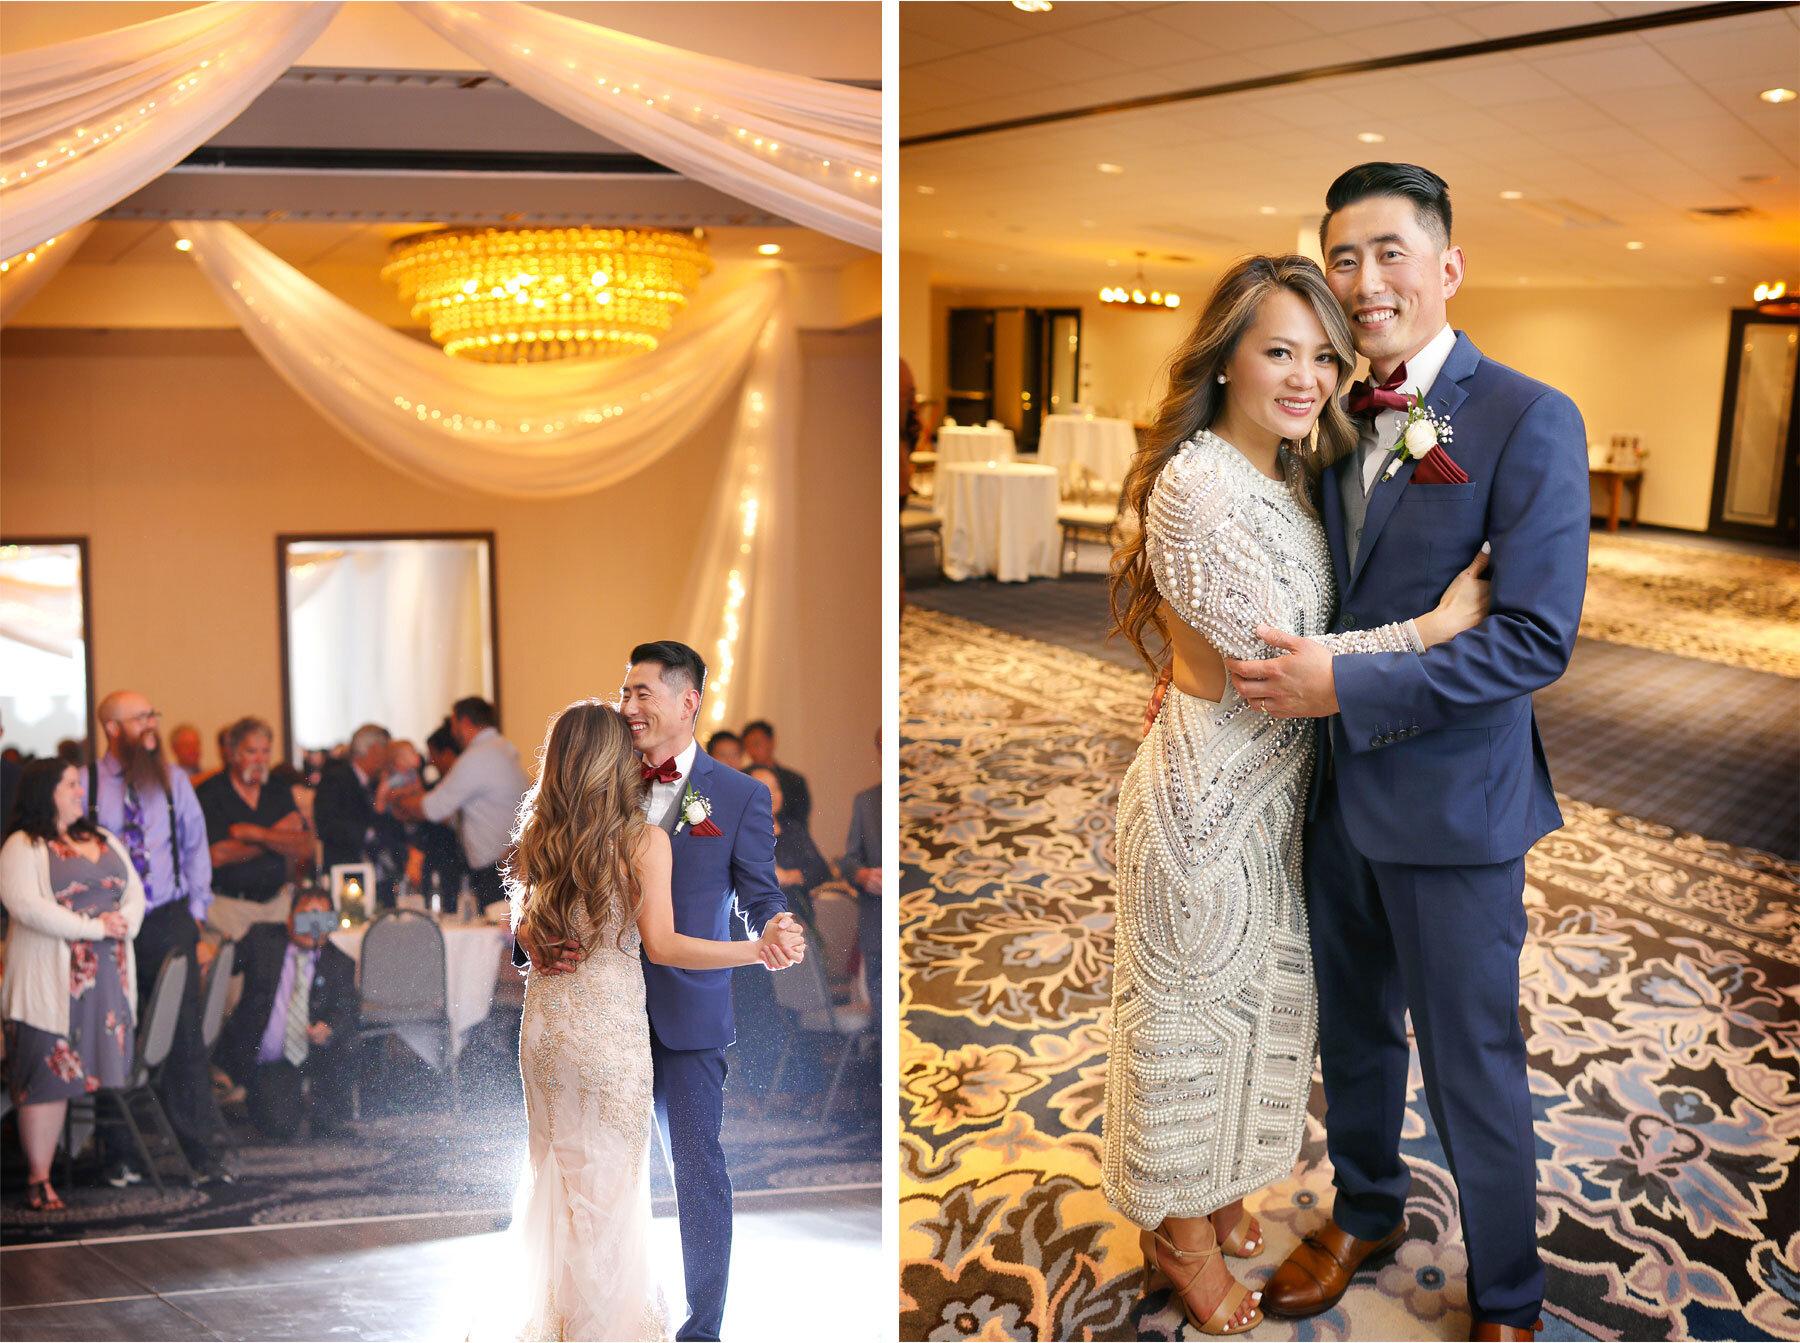 17-Vick-Photography-Minneapolis-Minnesota-The-Graduate-Hotel-Reception-Bride-Groom-First-Dance-Mai-&-Ross.jpg